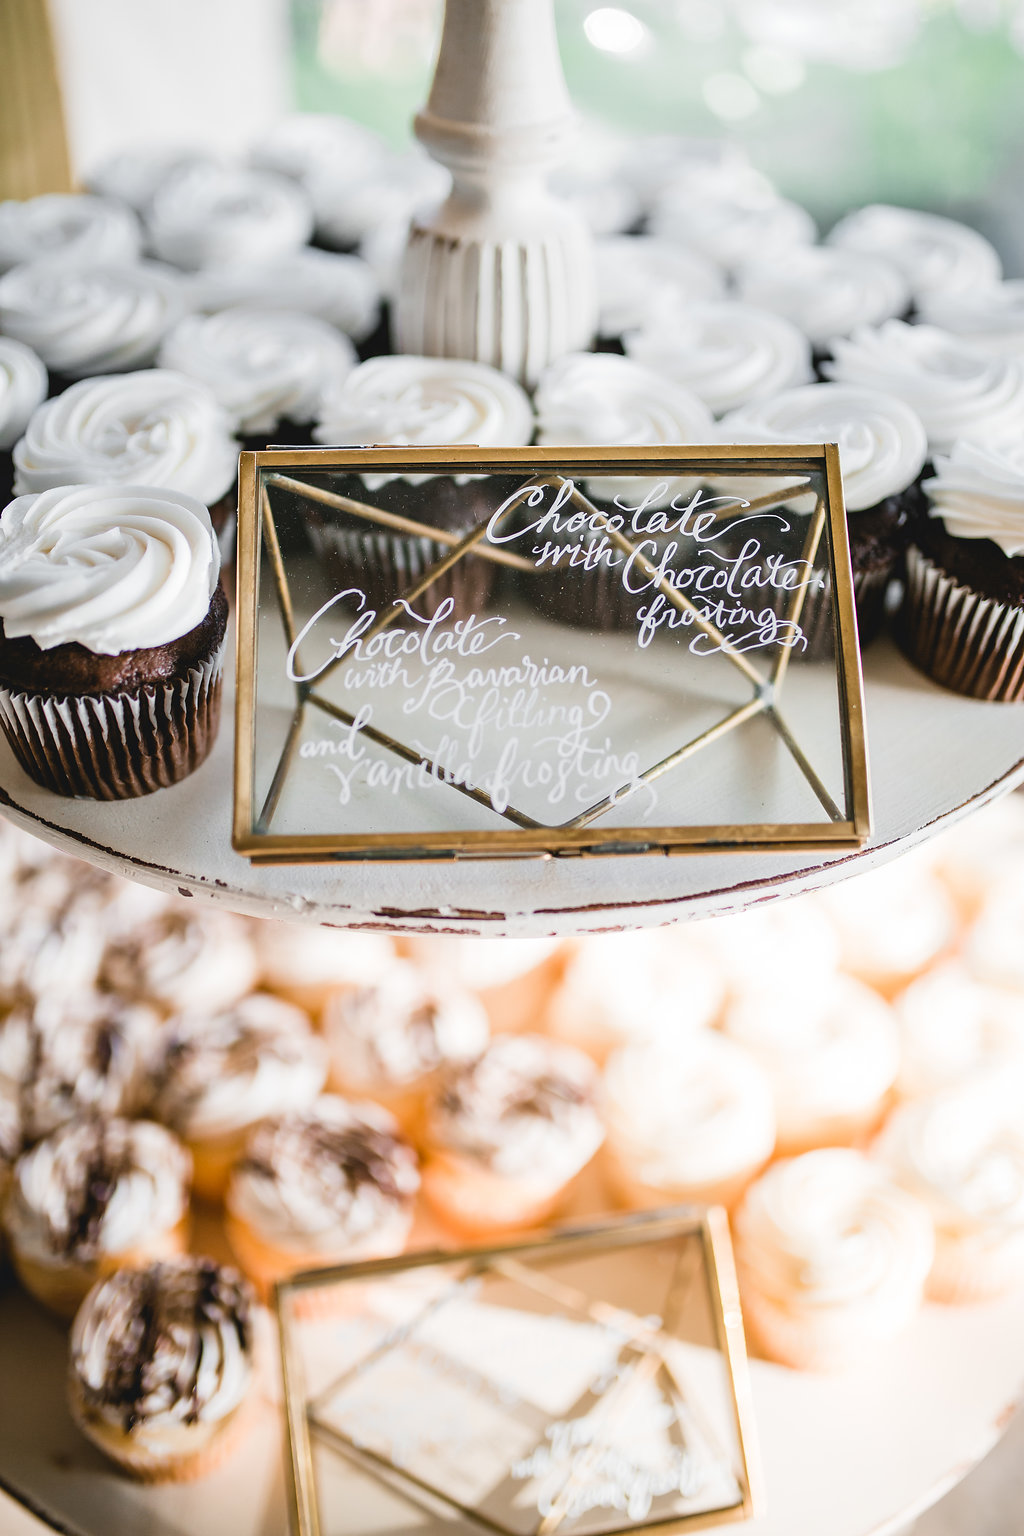 Leslee + Billy | Aqua Fox Photography | Legacy Hill Farm | dessert bar signage on geo domes by A Vintage Touch weddings